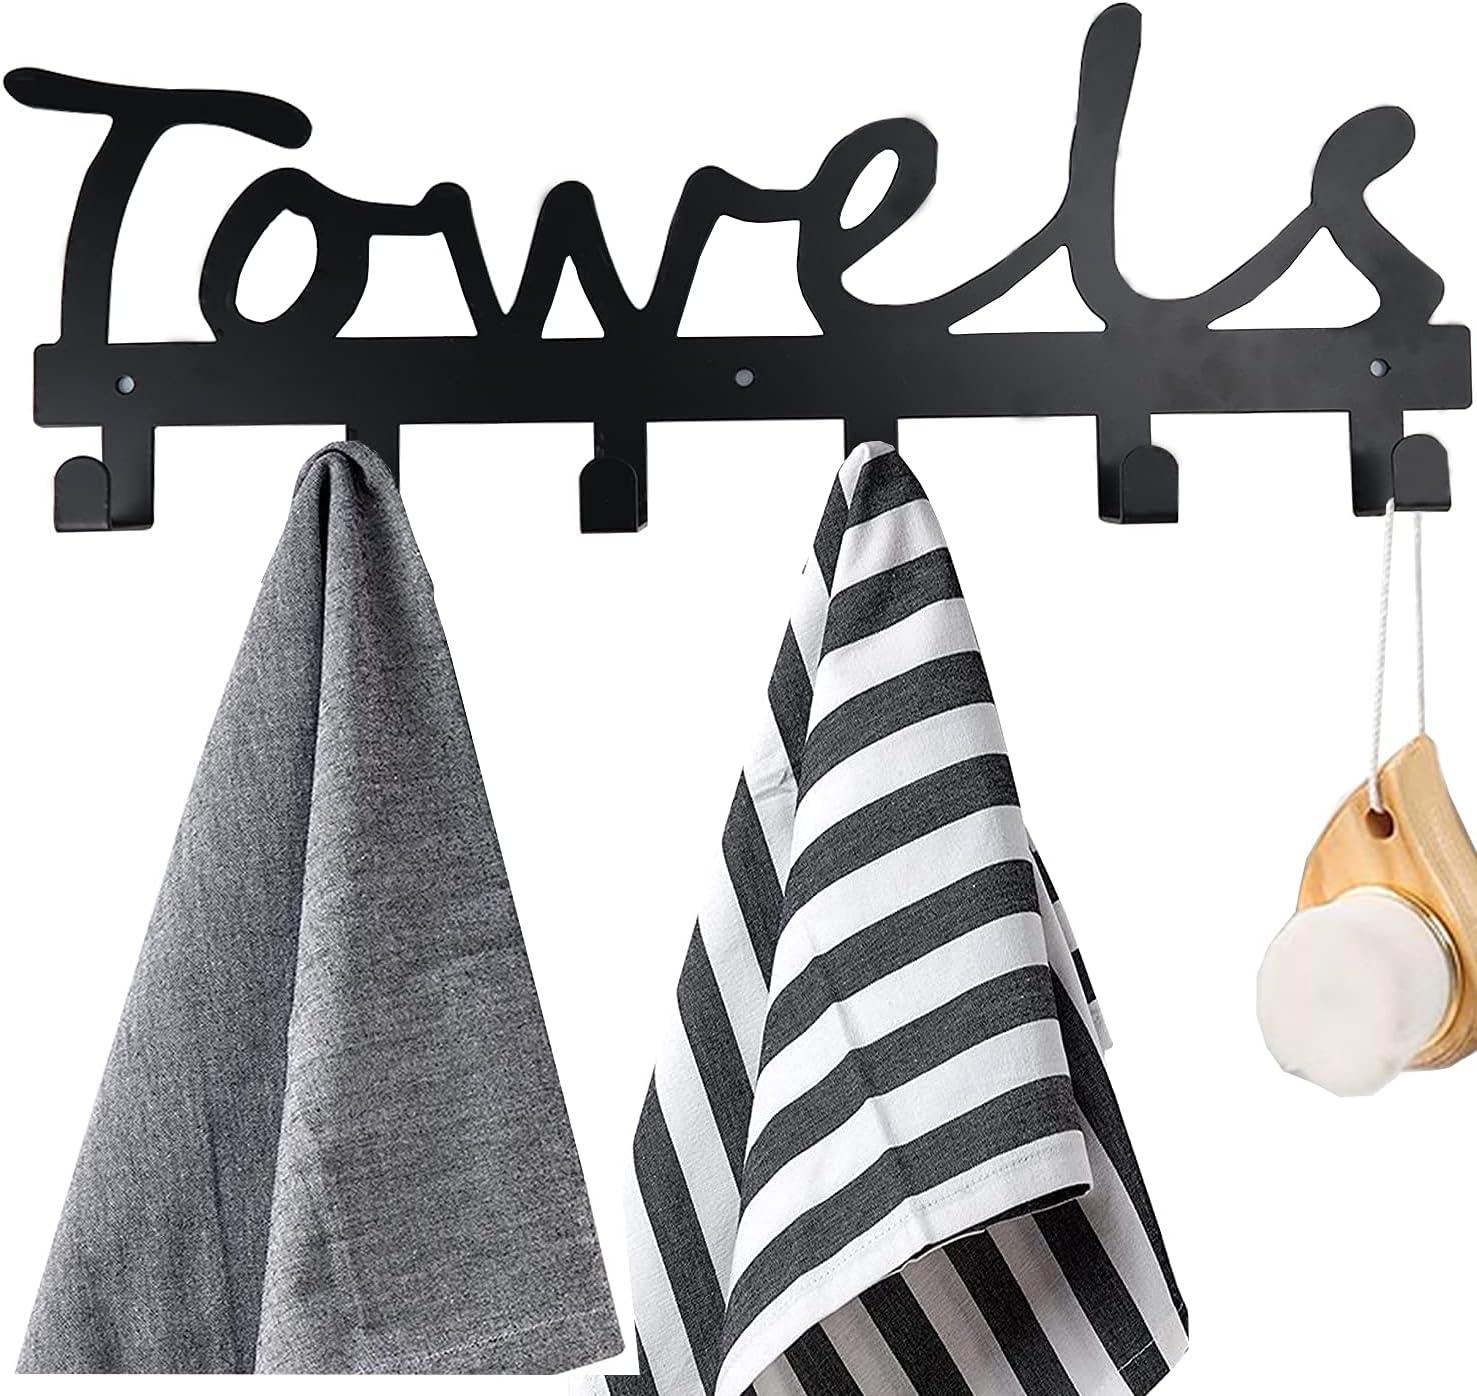 trend rank 25% OFF Towel Rack 6 Hooks Holder Bathroom Rustproof for and Water